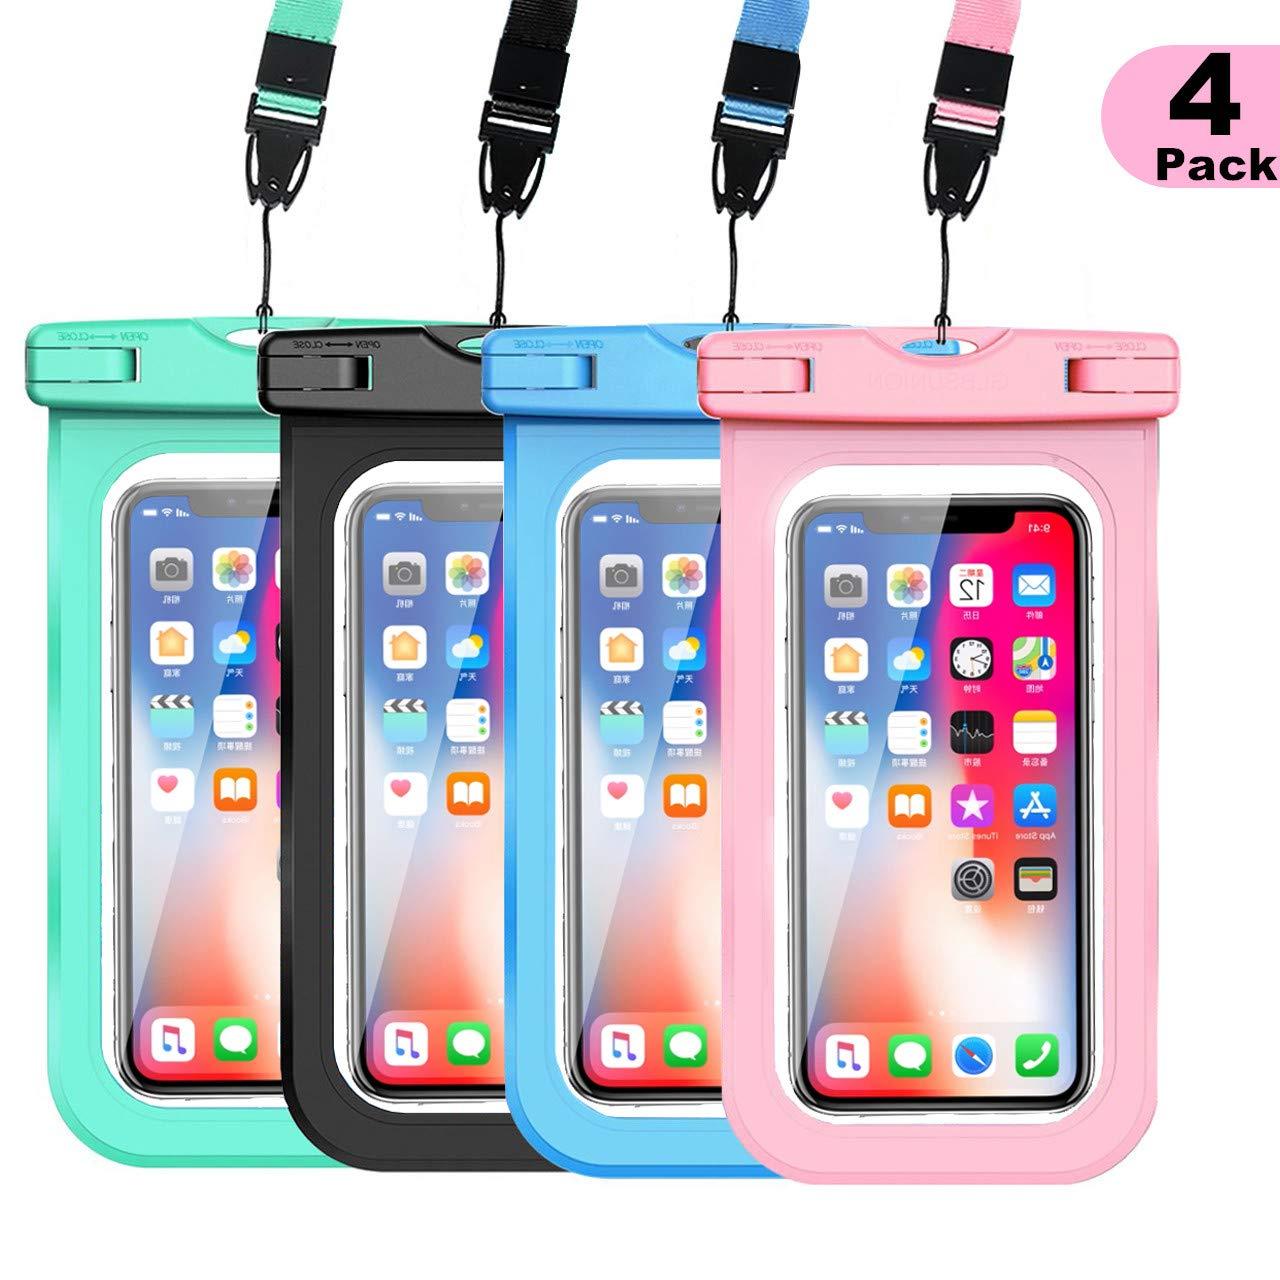 WJZXTEK Universal Waterproof Case,IPX8 Waterproof Phone Pouch Underwater Dry Bag,Compatible iPhone Xs Max/Xr/X/8/8plus/7/7plus Galaxy s9/s8 Note 9/8 Google Pixel up to 6.5''(Black+Pink+Blue+Black)